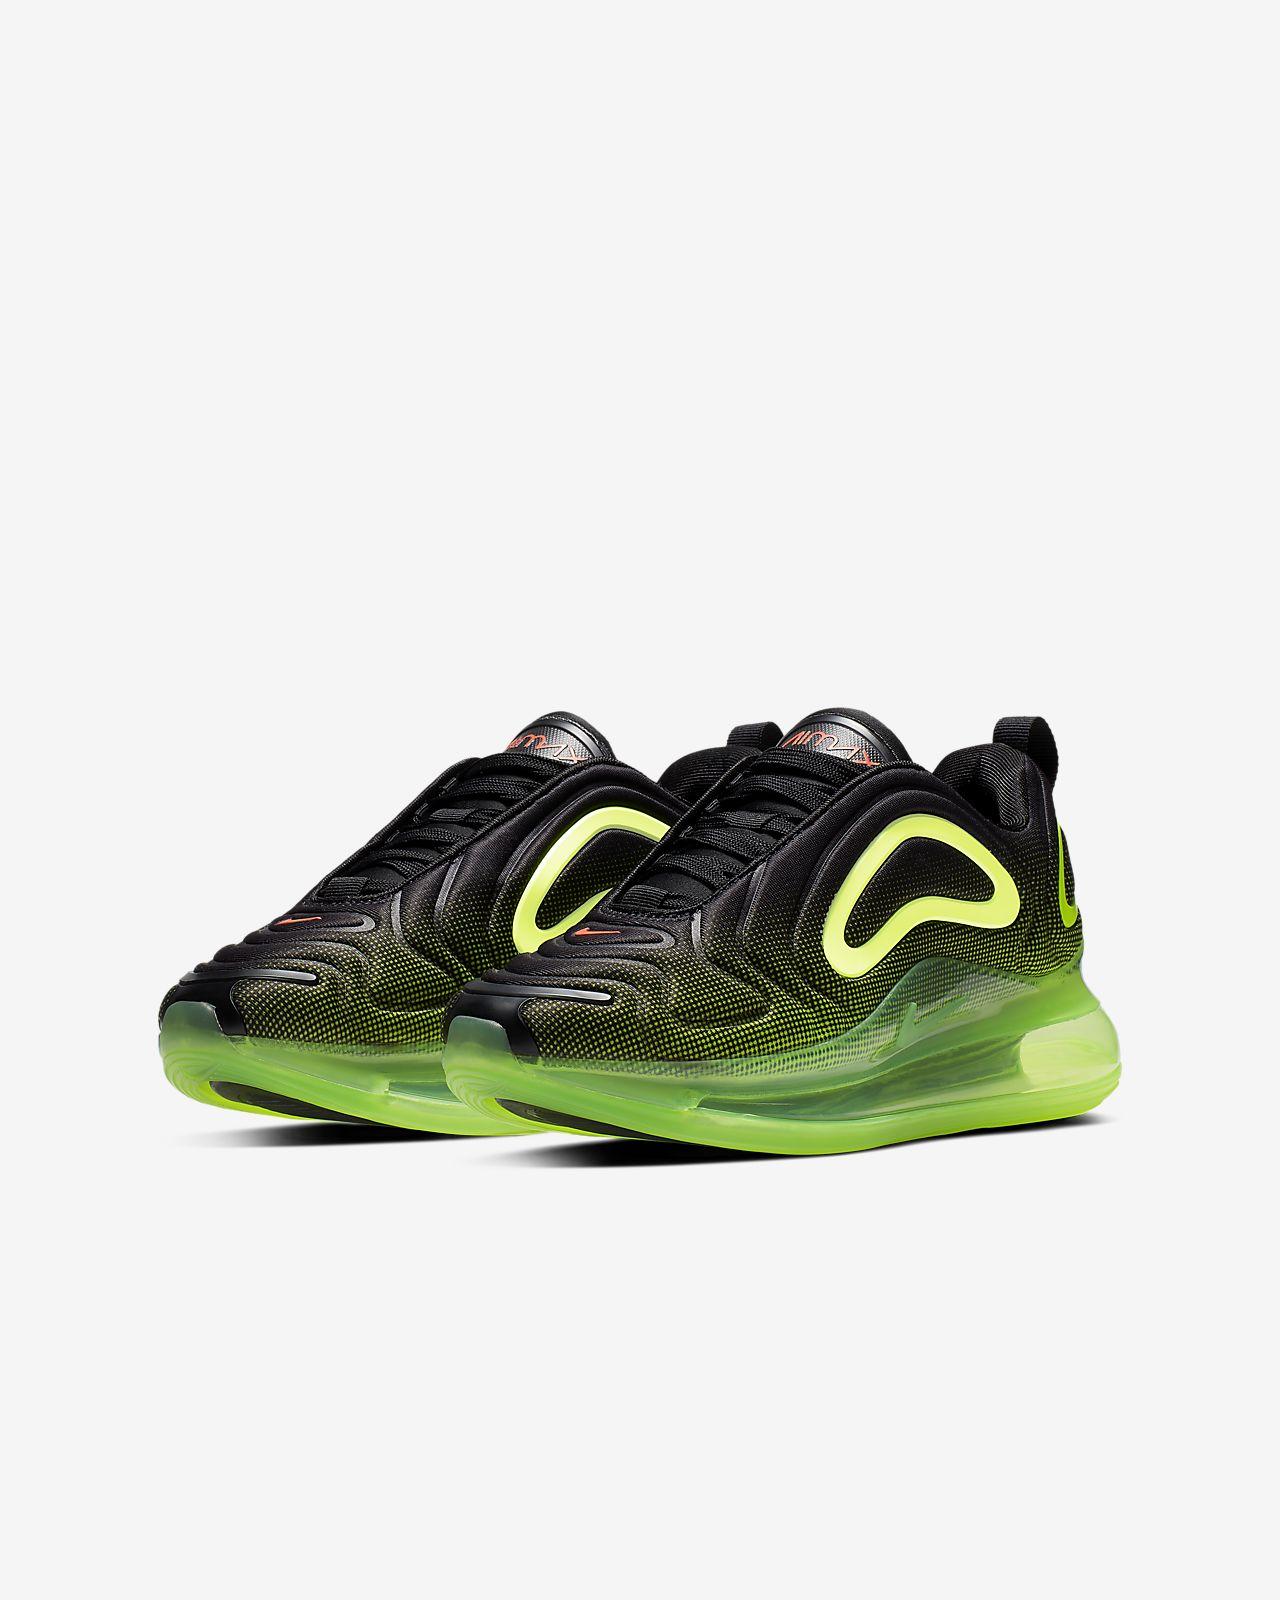 aab594358e Nike Air Max 720 Younger/Older Kids' Shoe. Nike.com LU